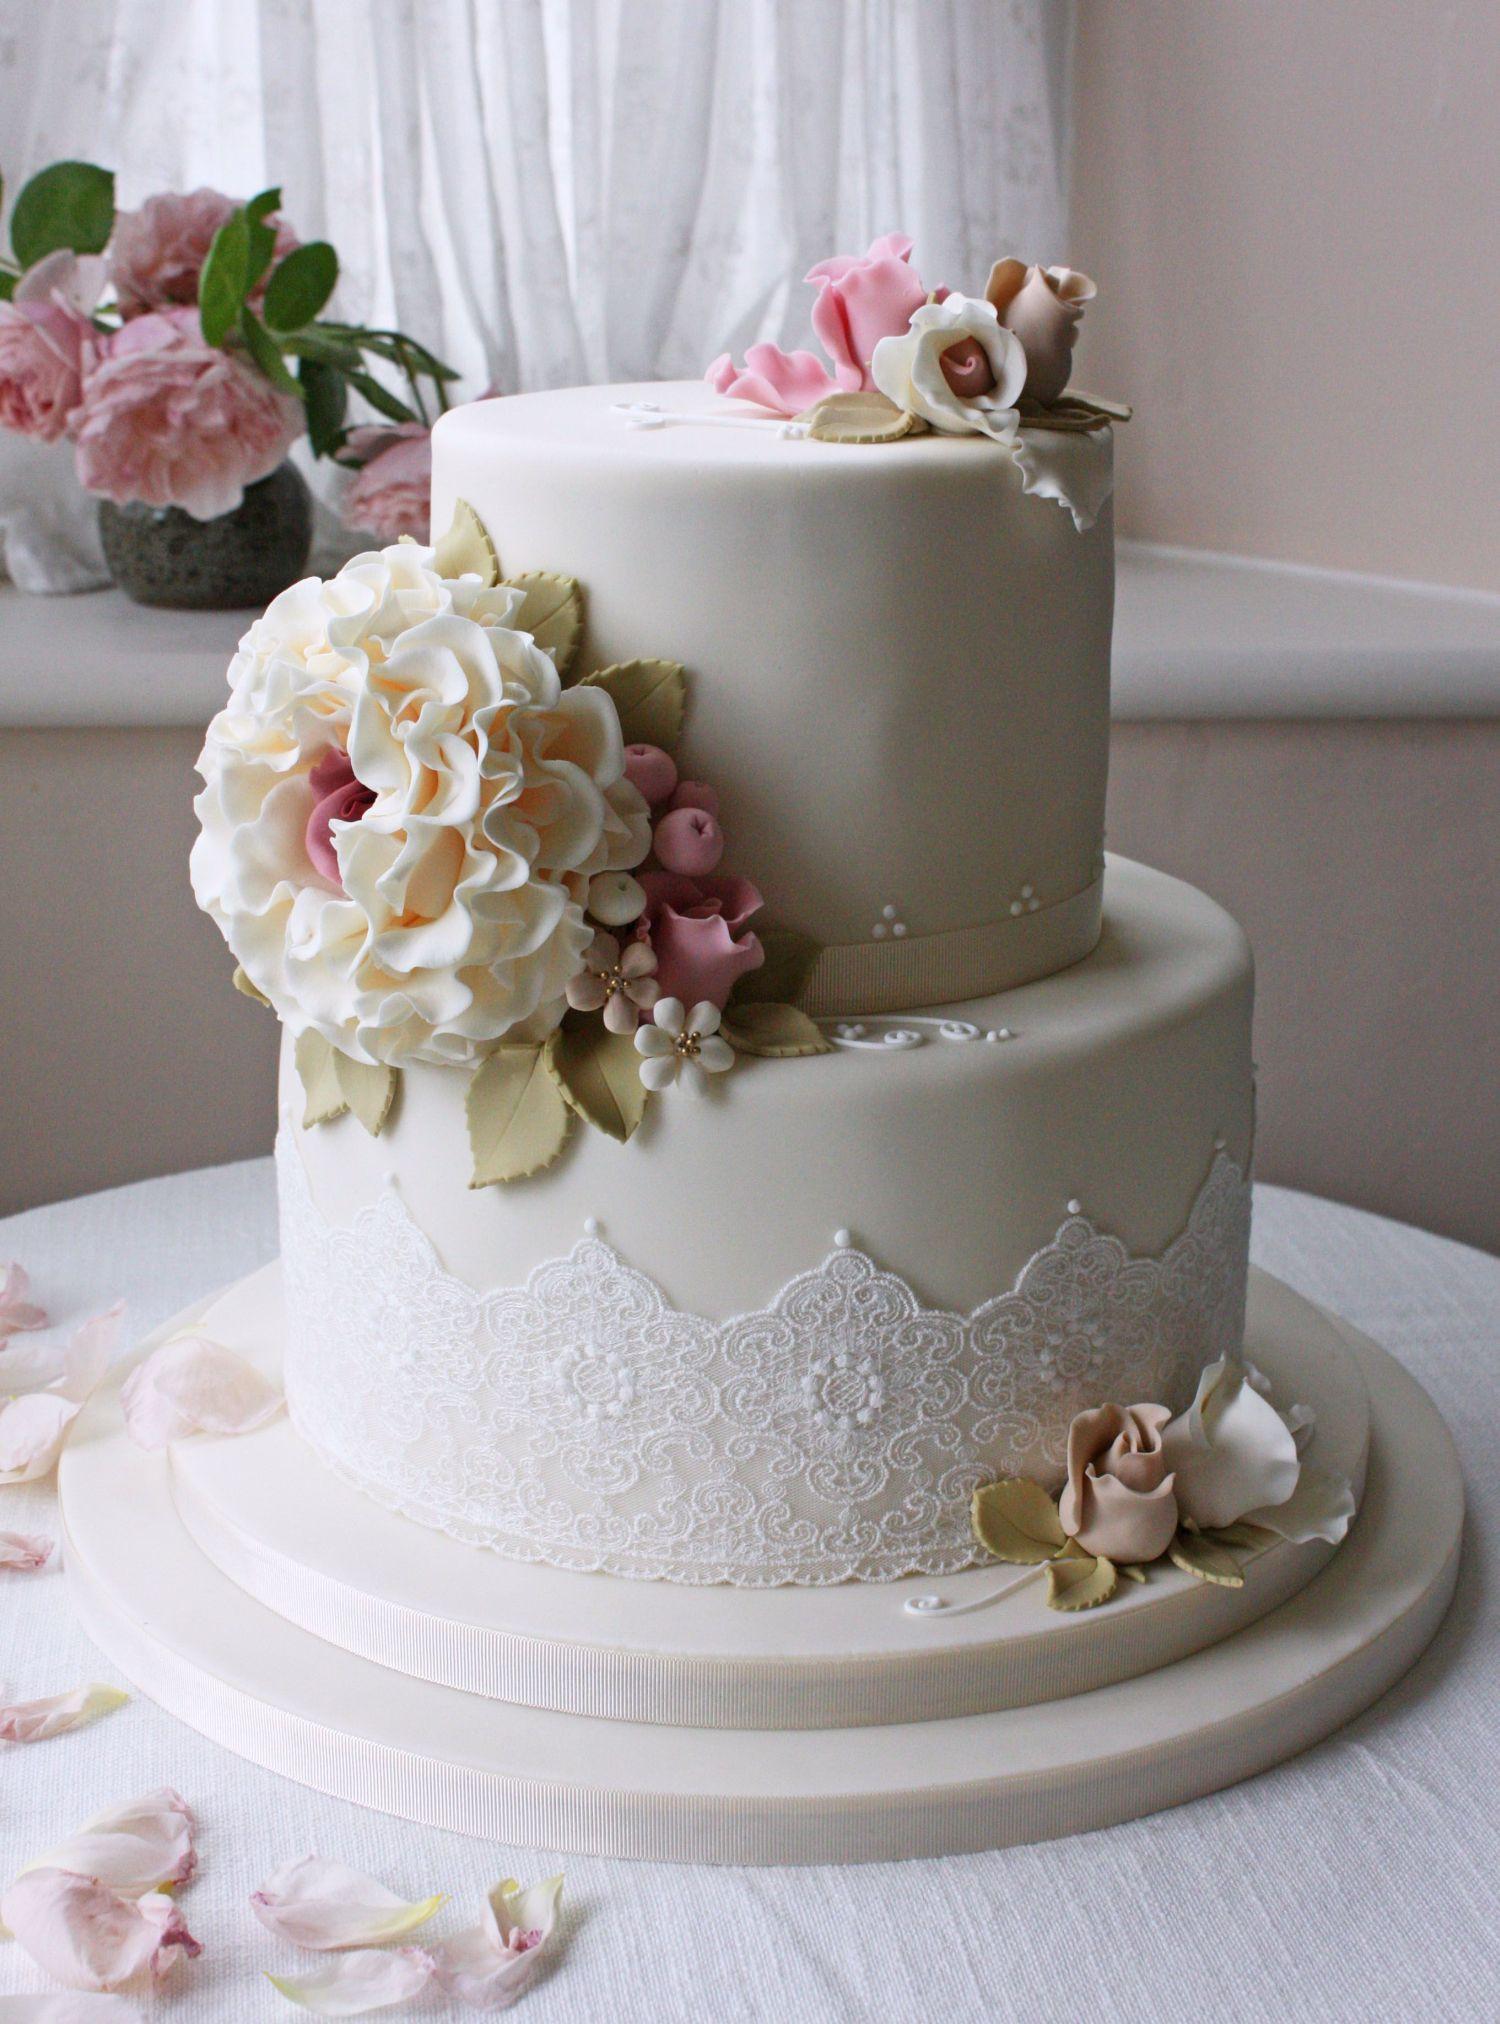 Tiered Wedding Cakes  Wedding Cake Ideas